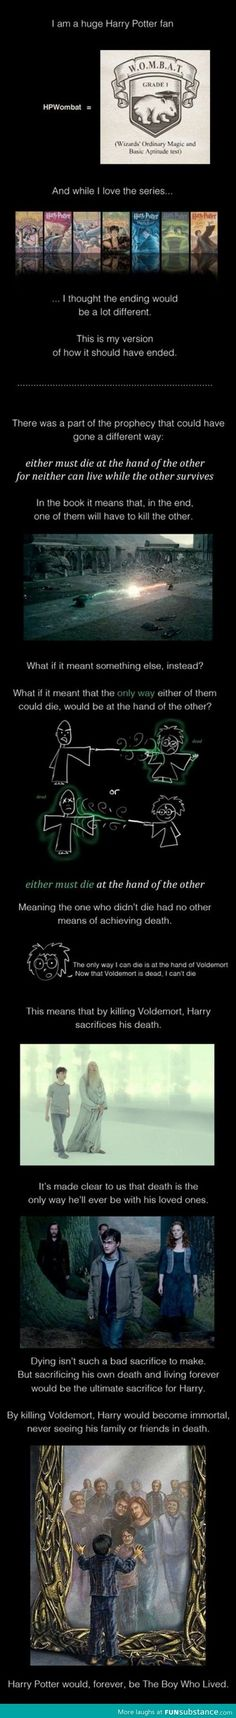 An alternative Harry Potter ending